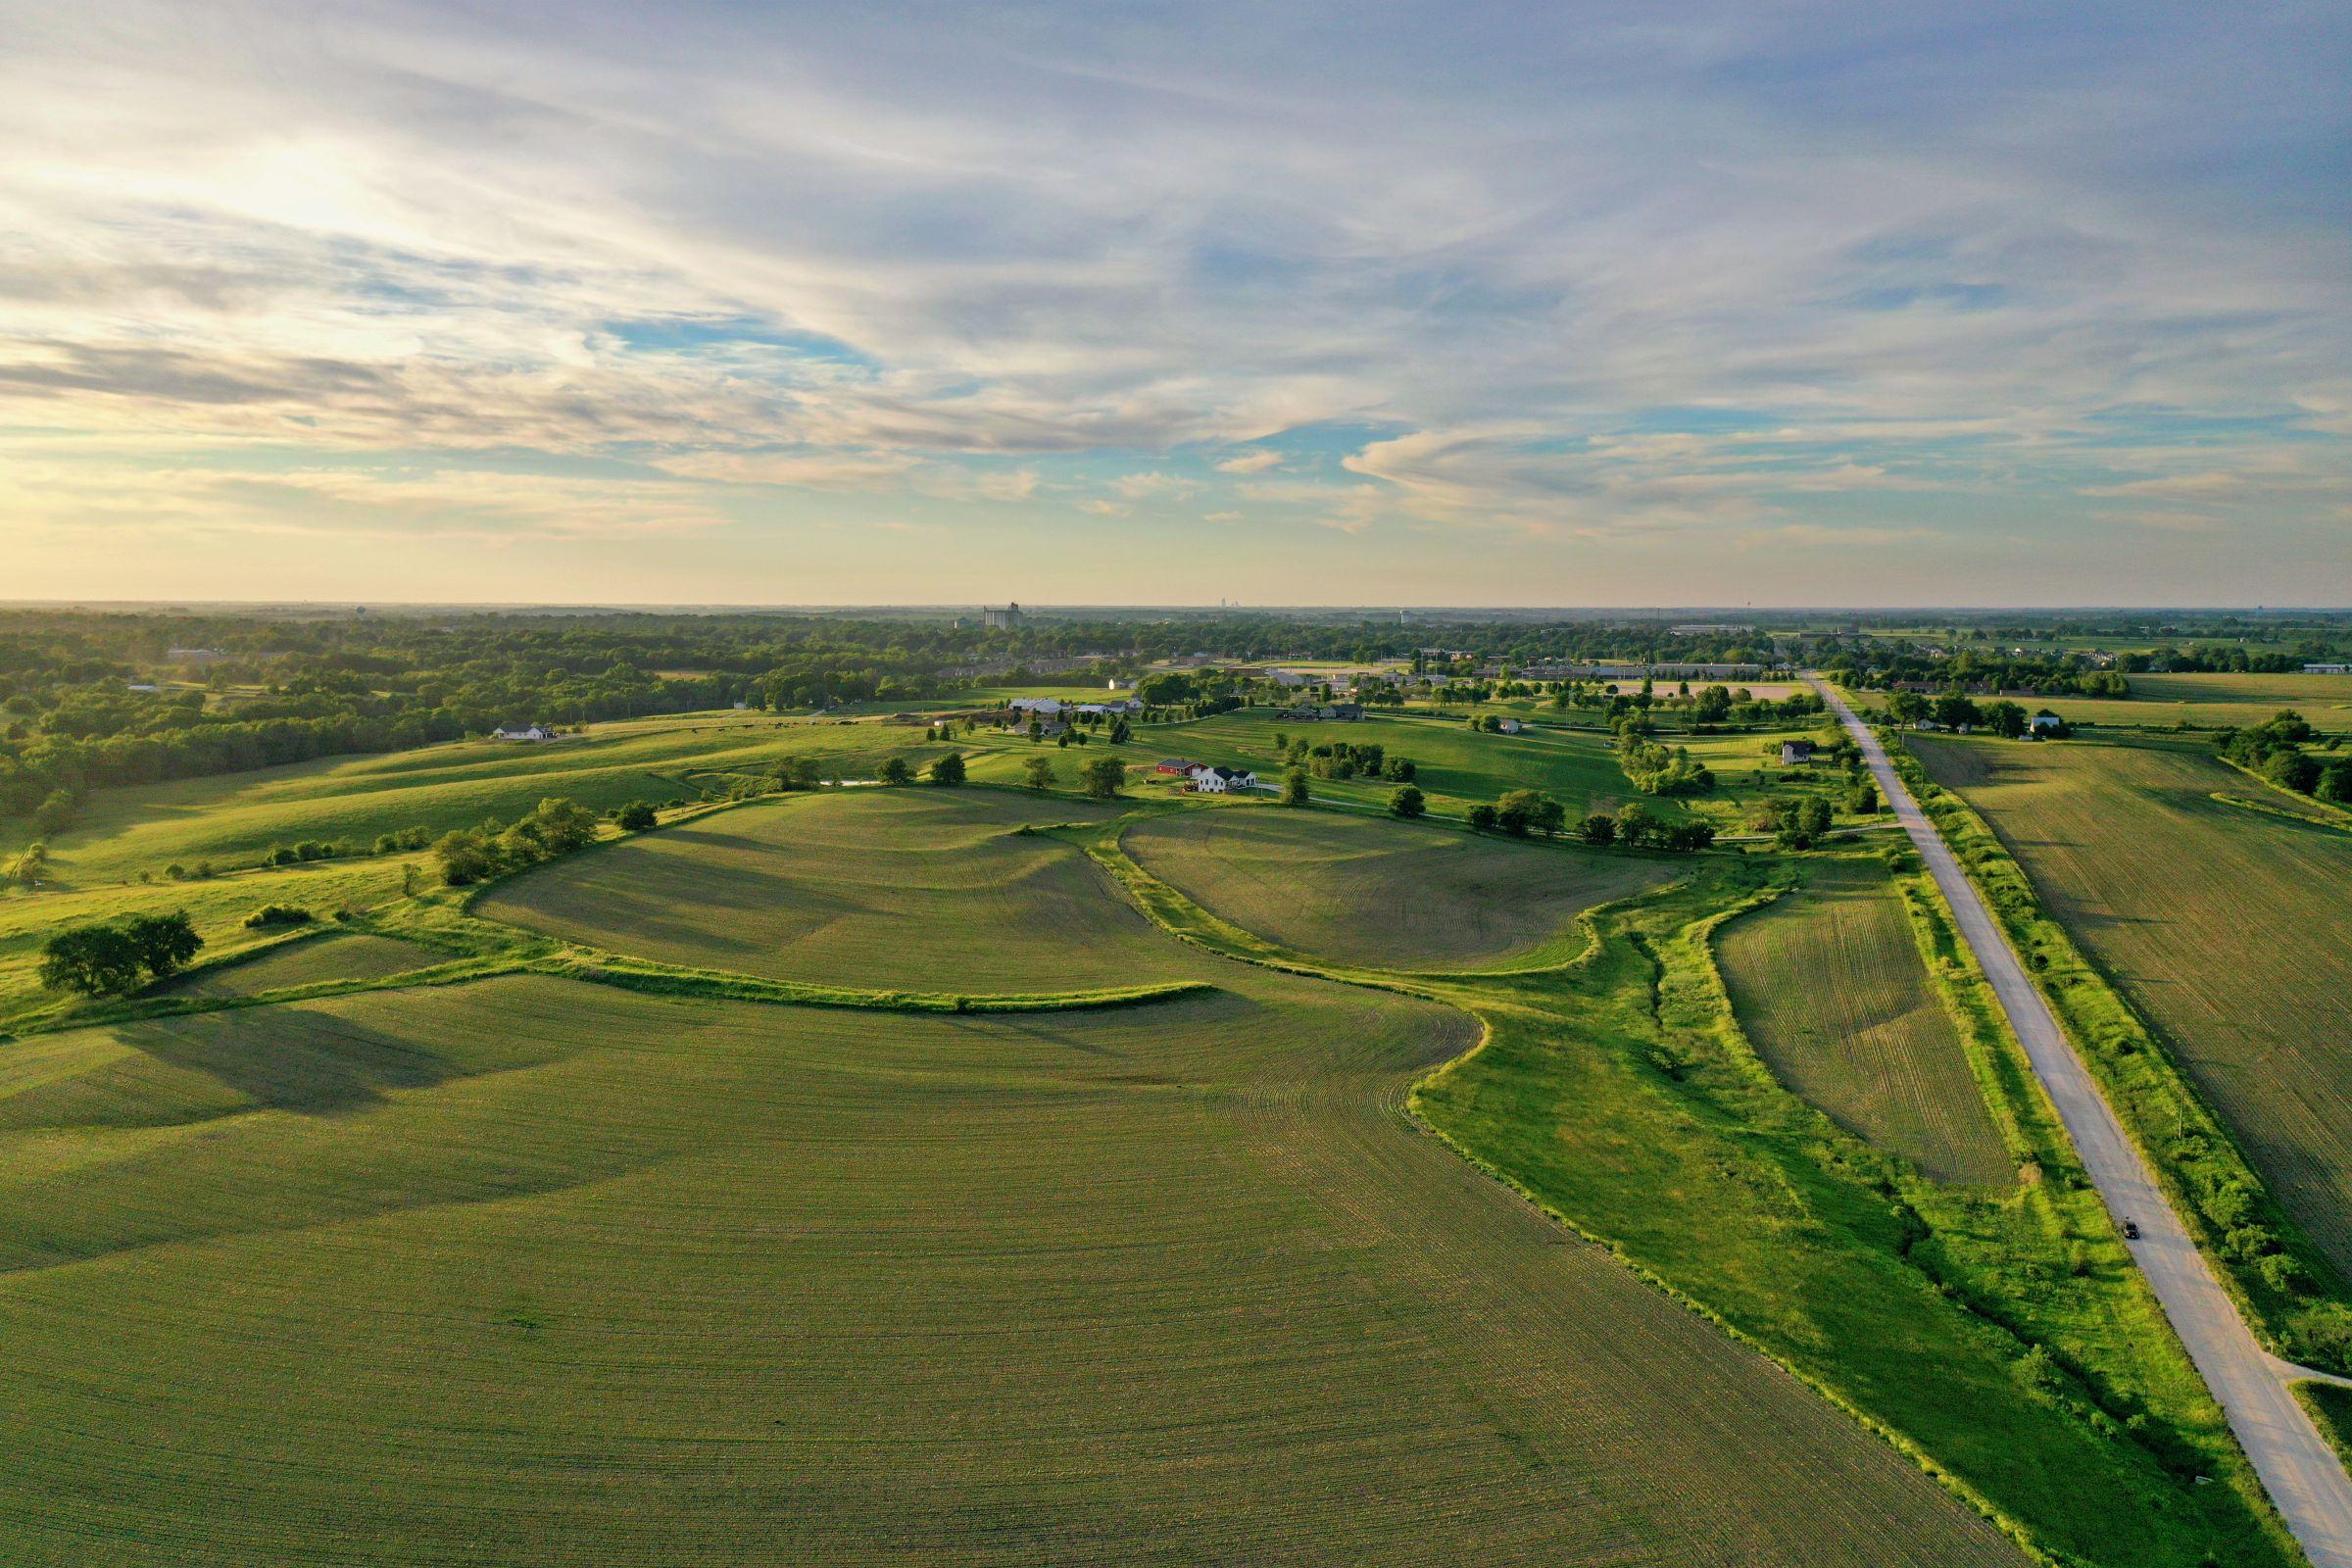 land-warren-county-iowa-20-acres-listing-number-15425-4-2021-03-25-193610.JPG